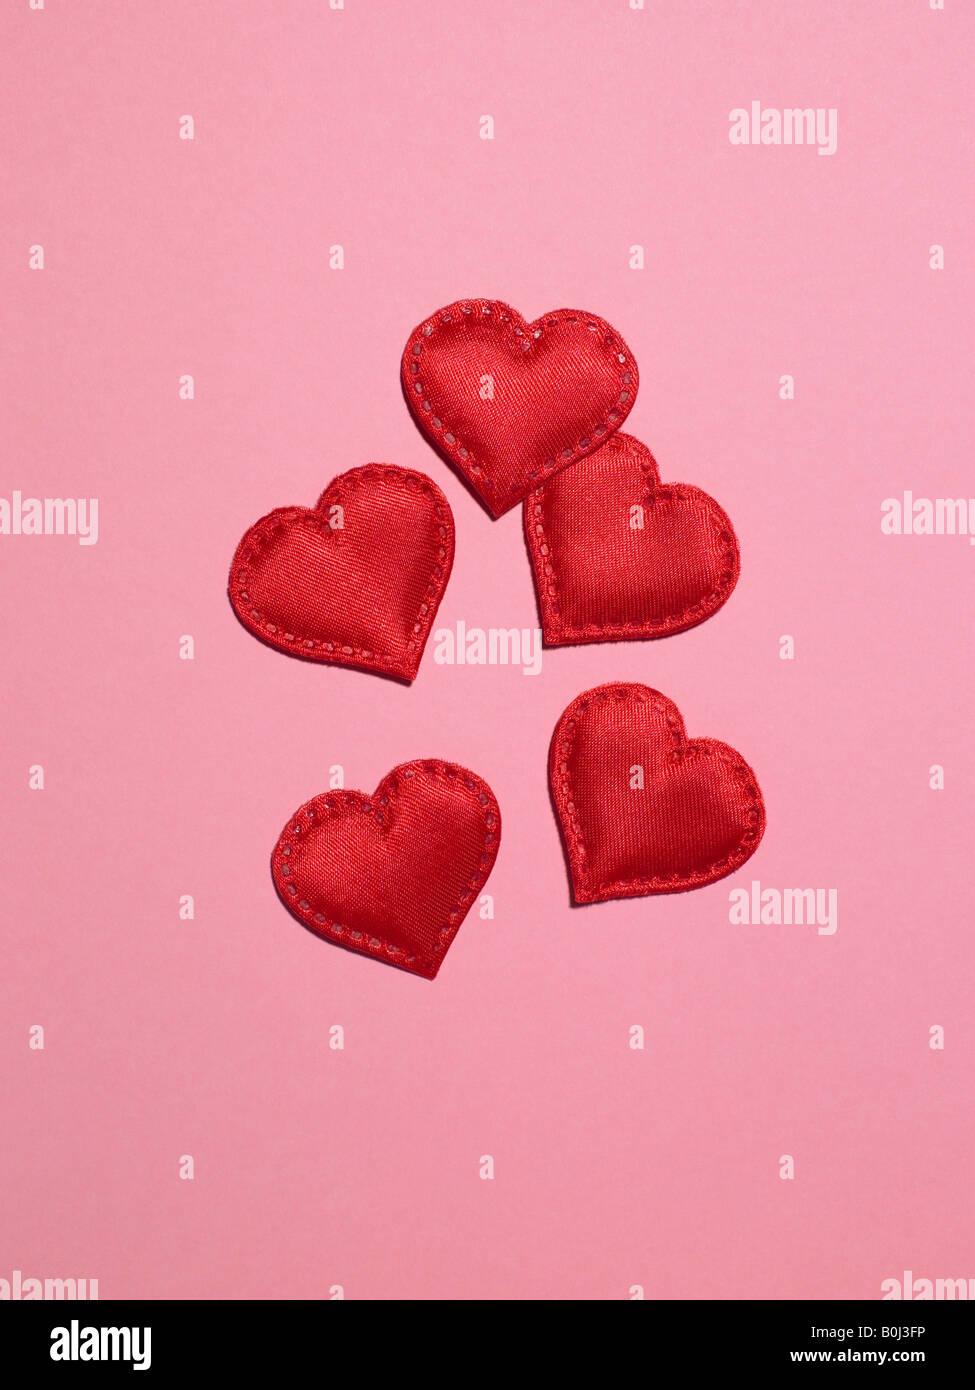 Coeurs sur fond rose Photo Stock